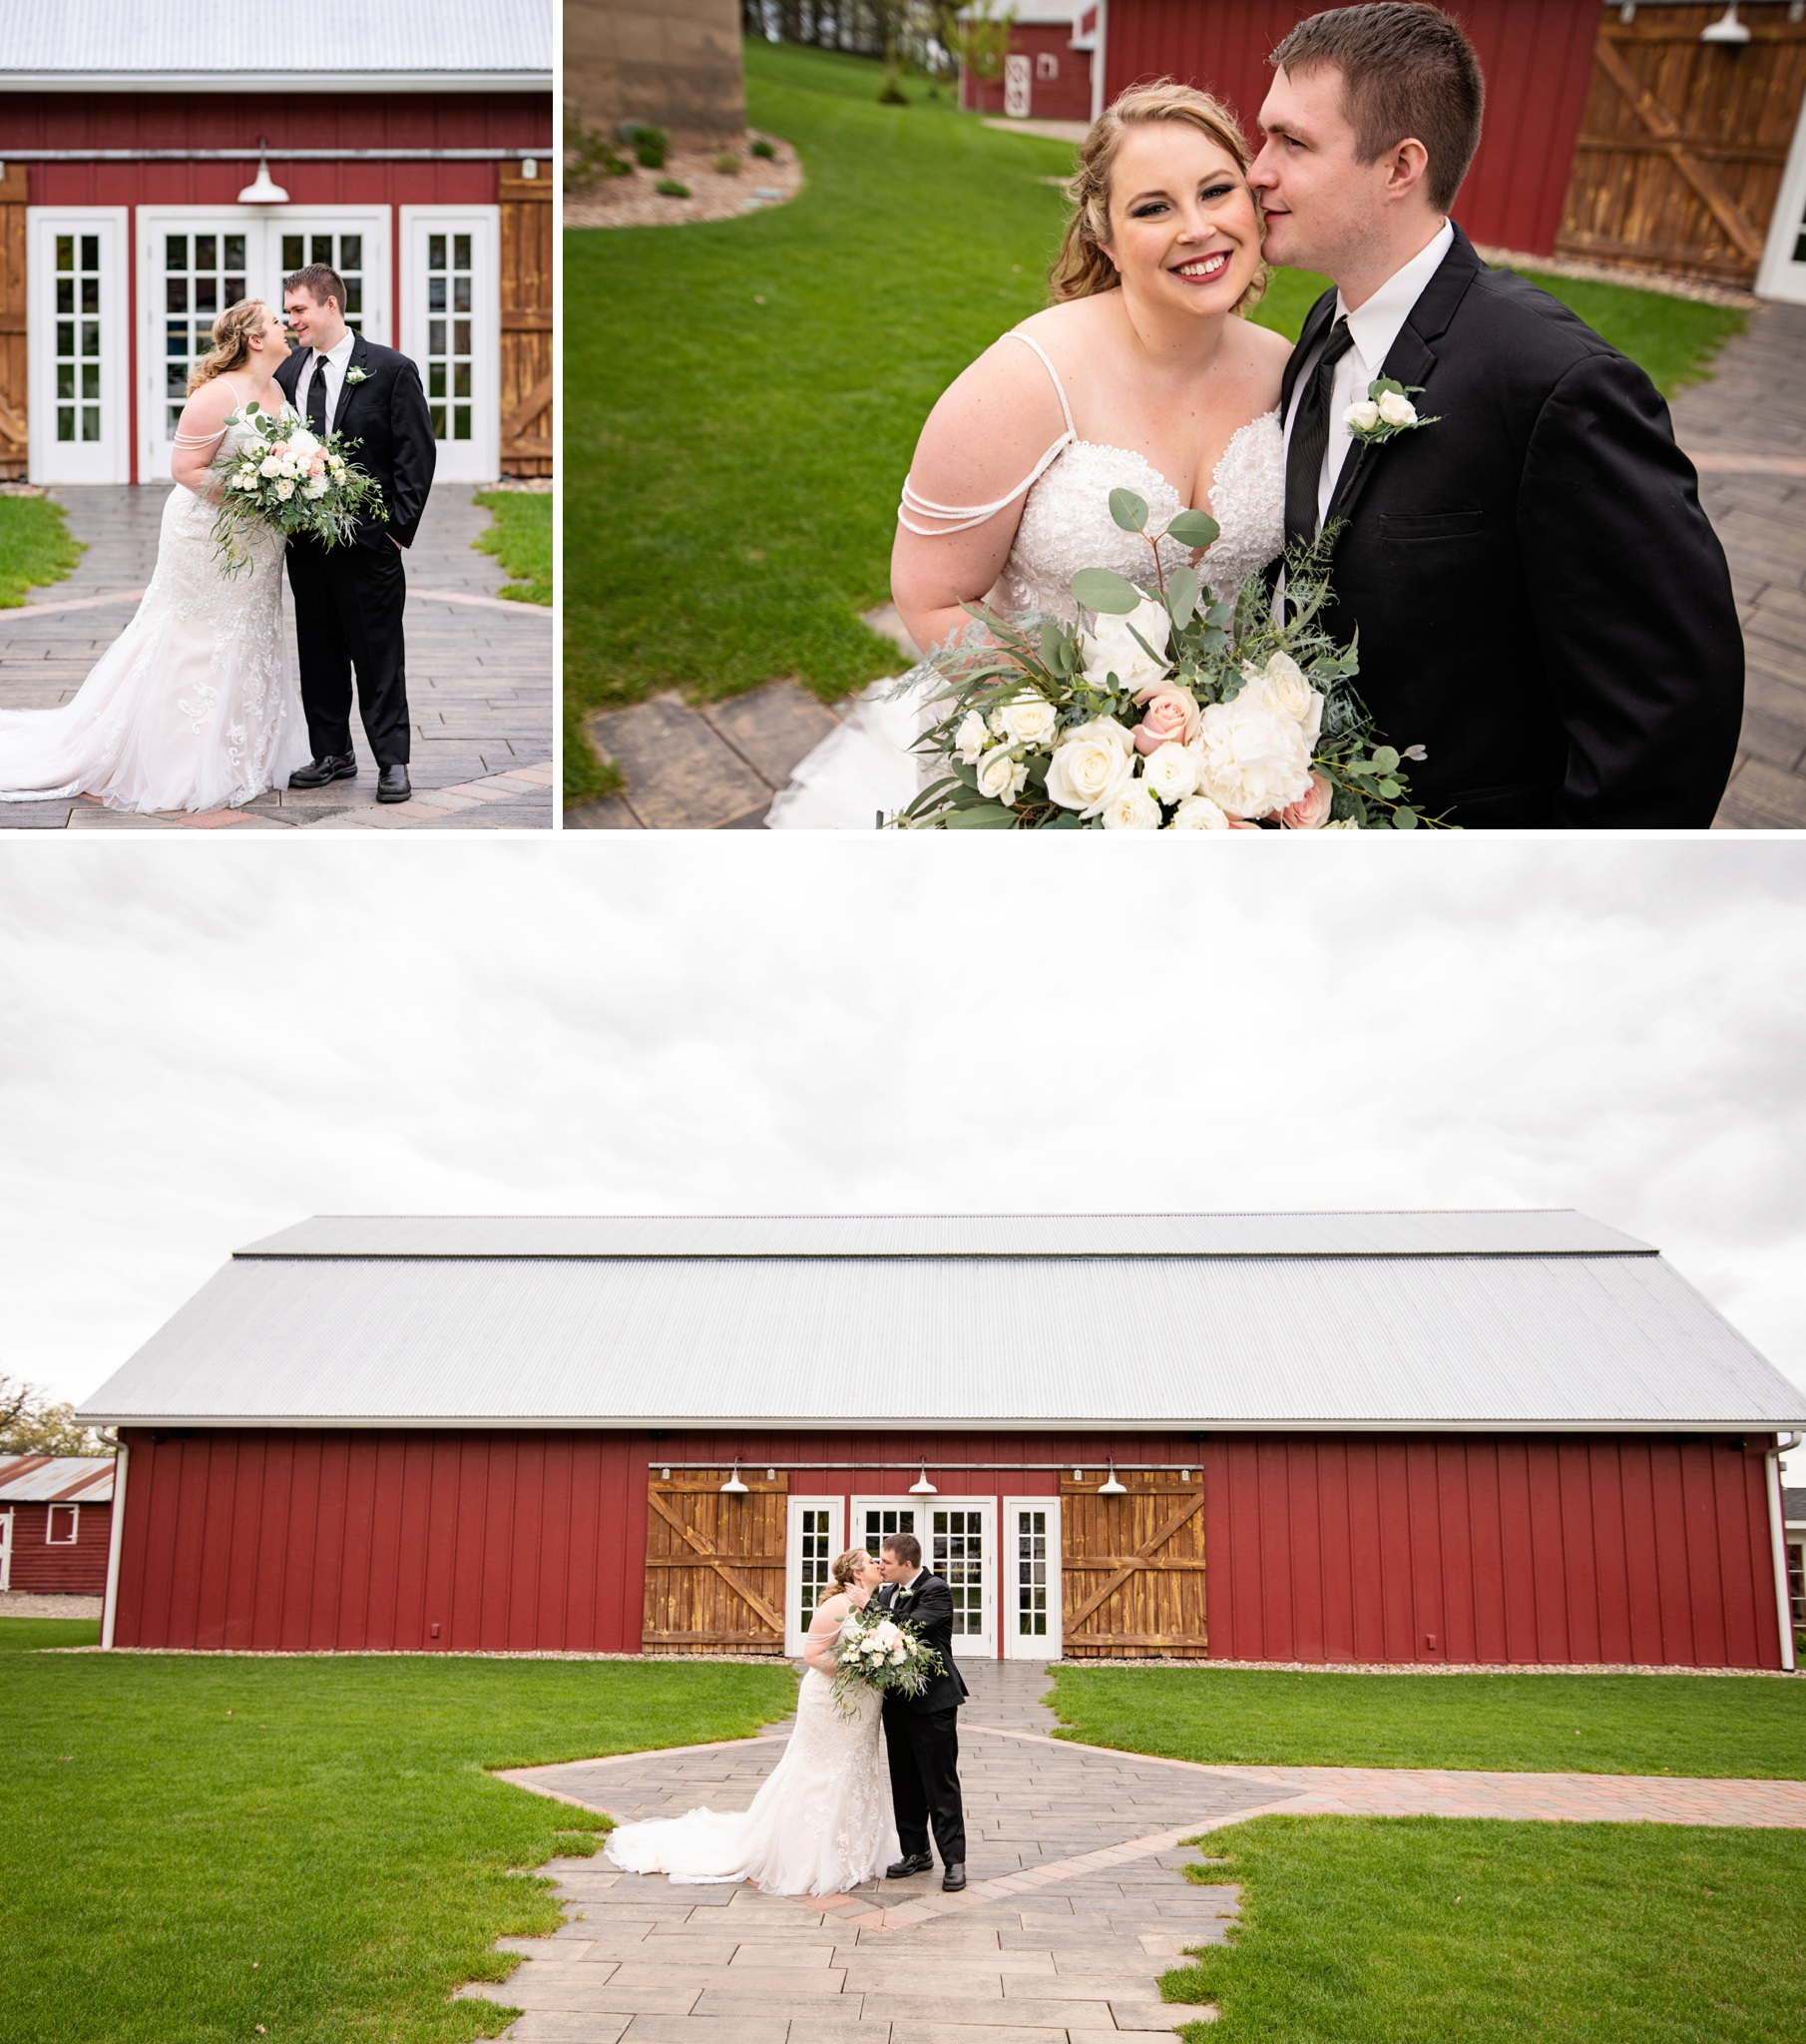 Cassie-Corbin-Wedding-05-25-2019-Rotella-Photography-PREV-97-206_BLOG.jpg